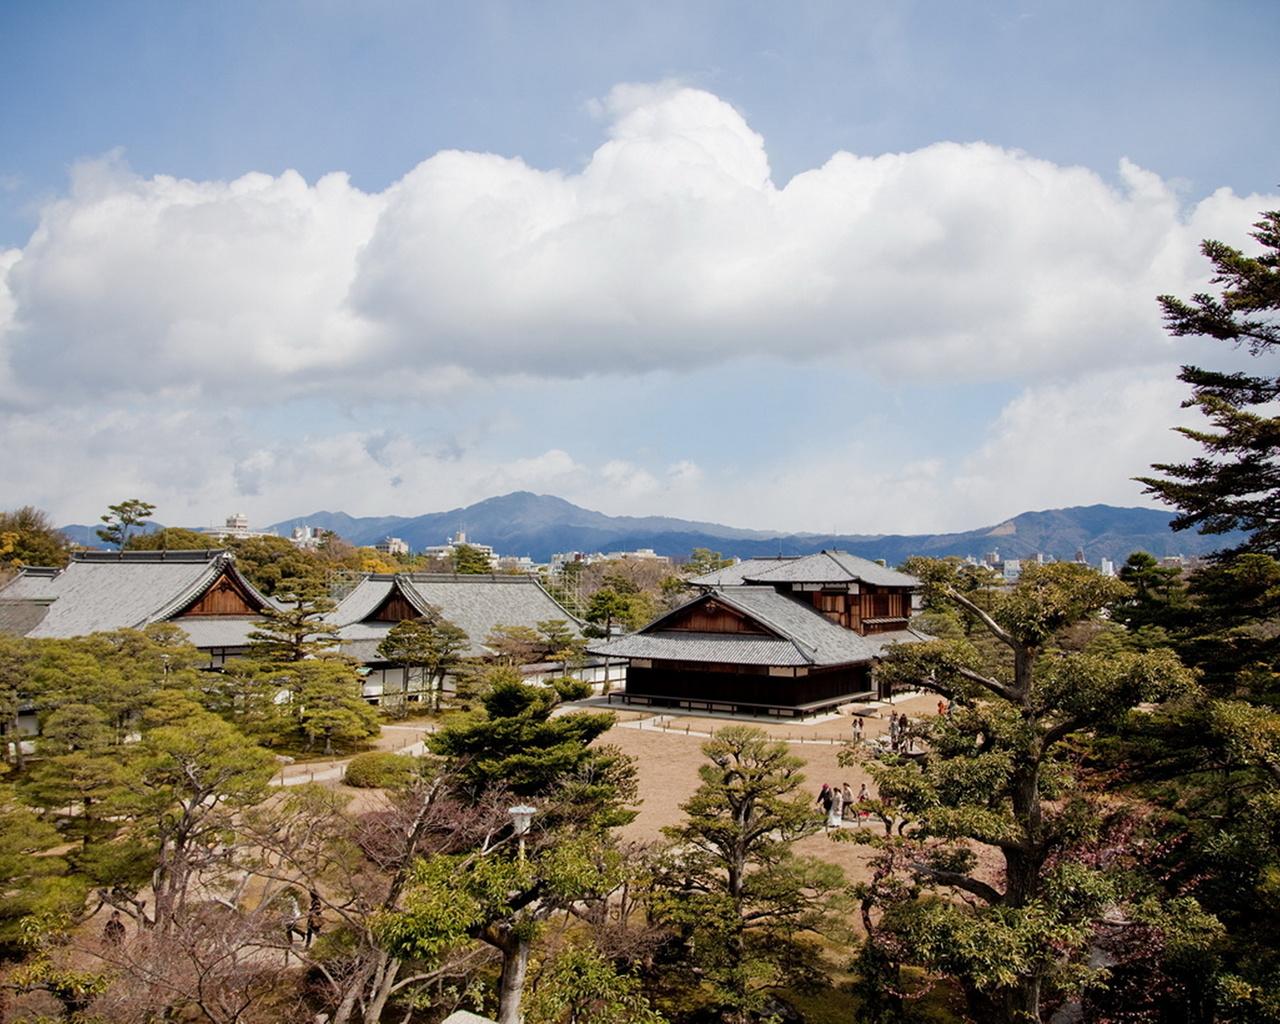 Япония, киото, деревья, дома, небо, красота